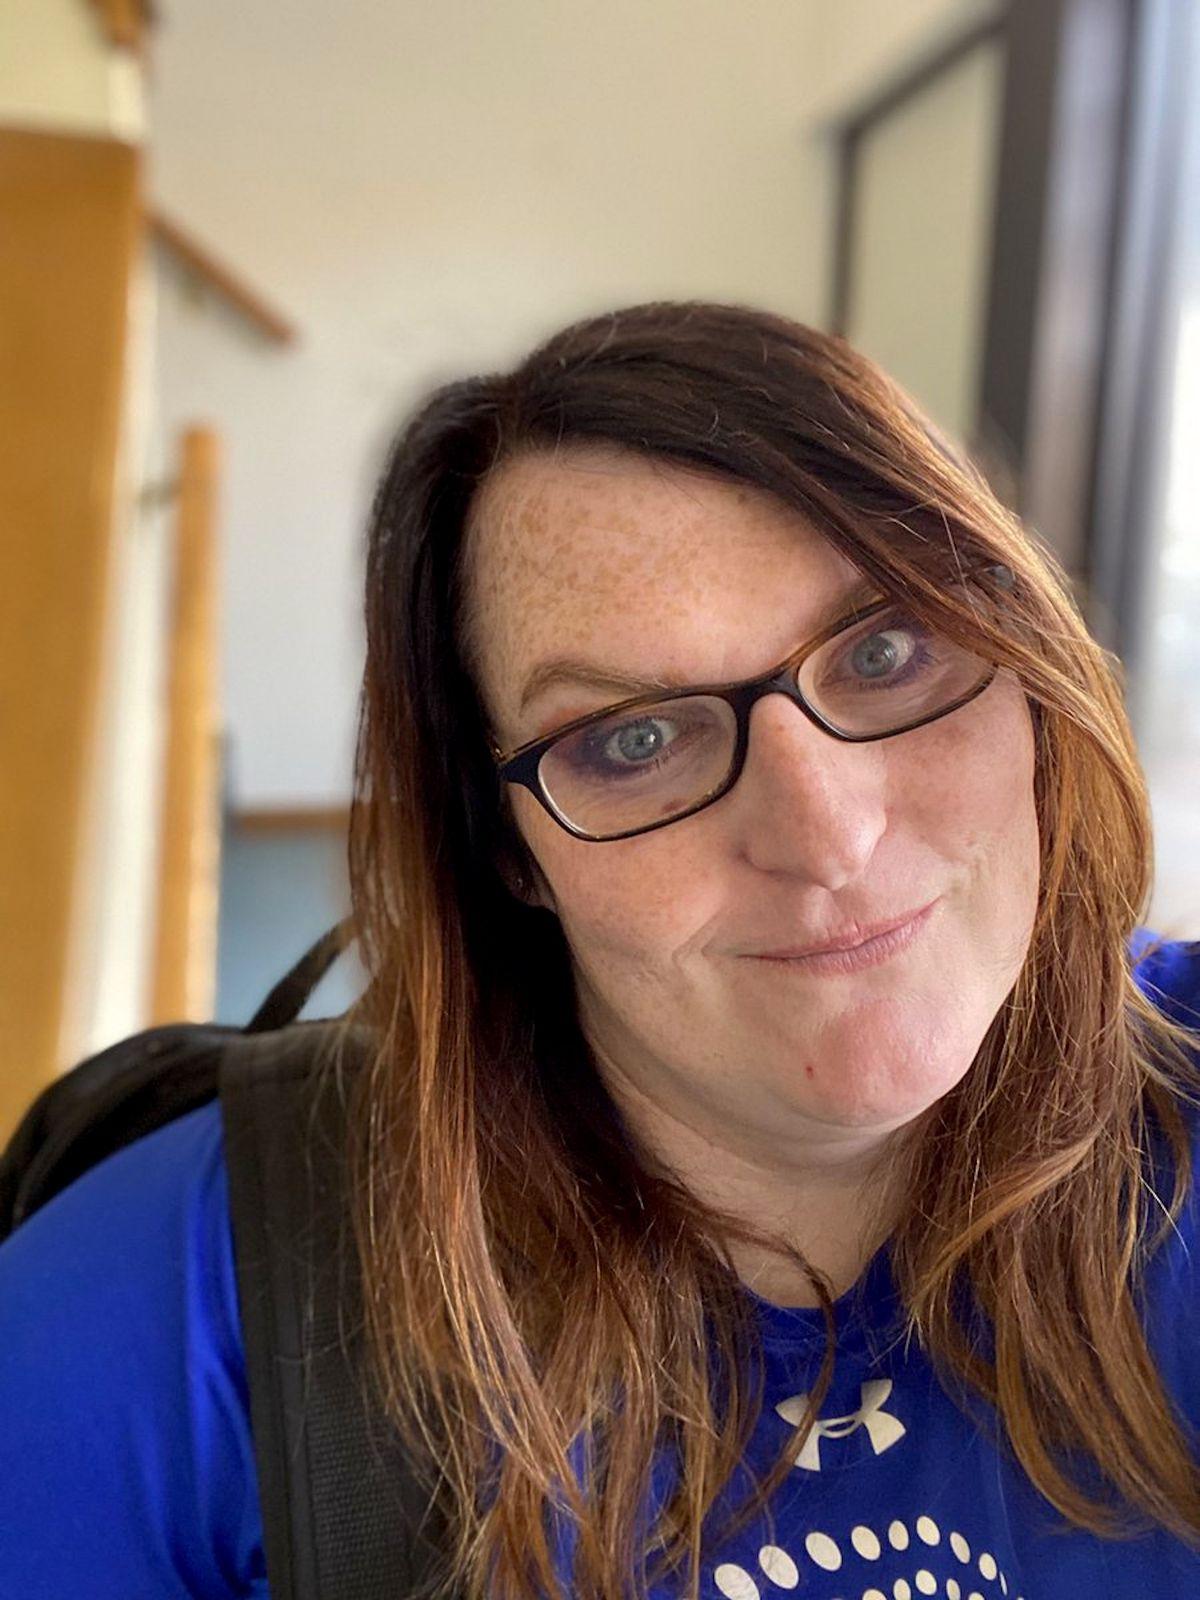 Tori Gleason is a sports chiropractor in Kansas.